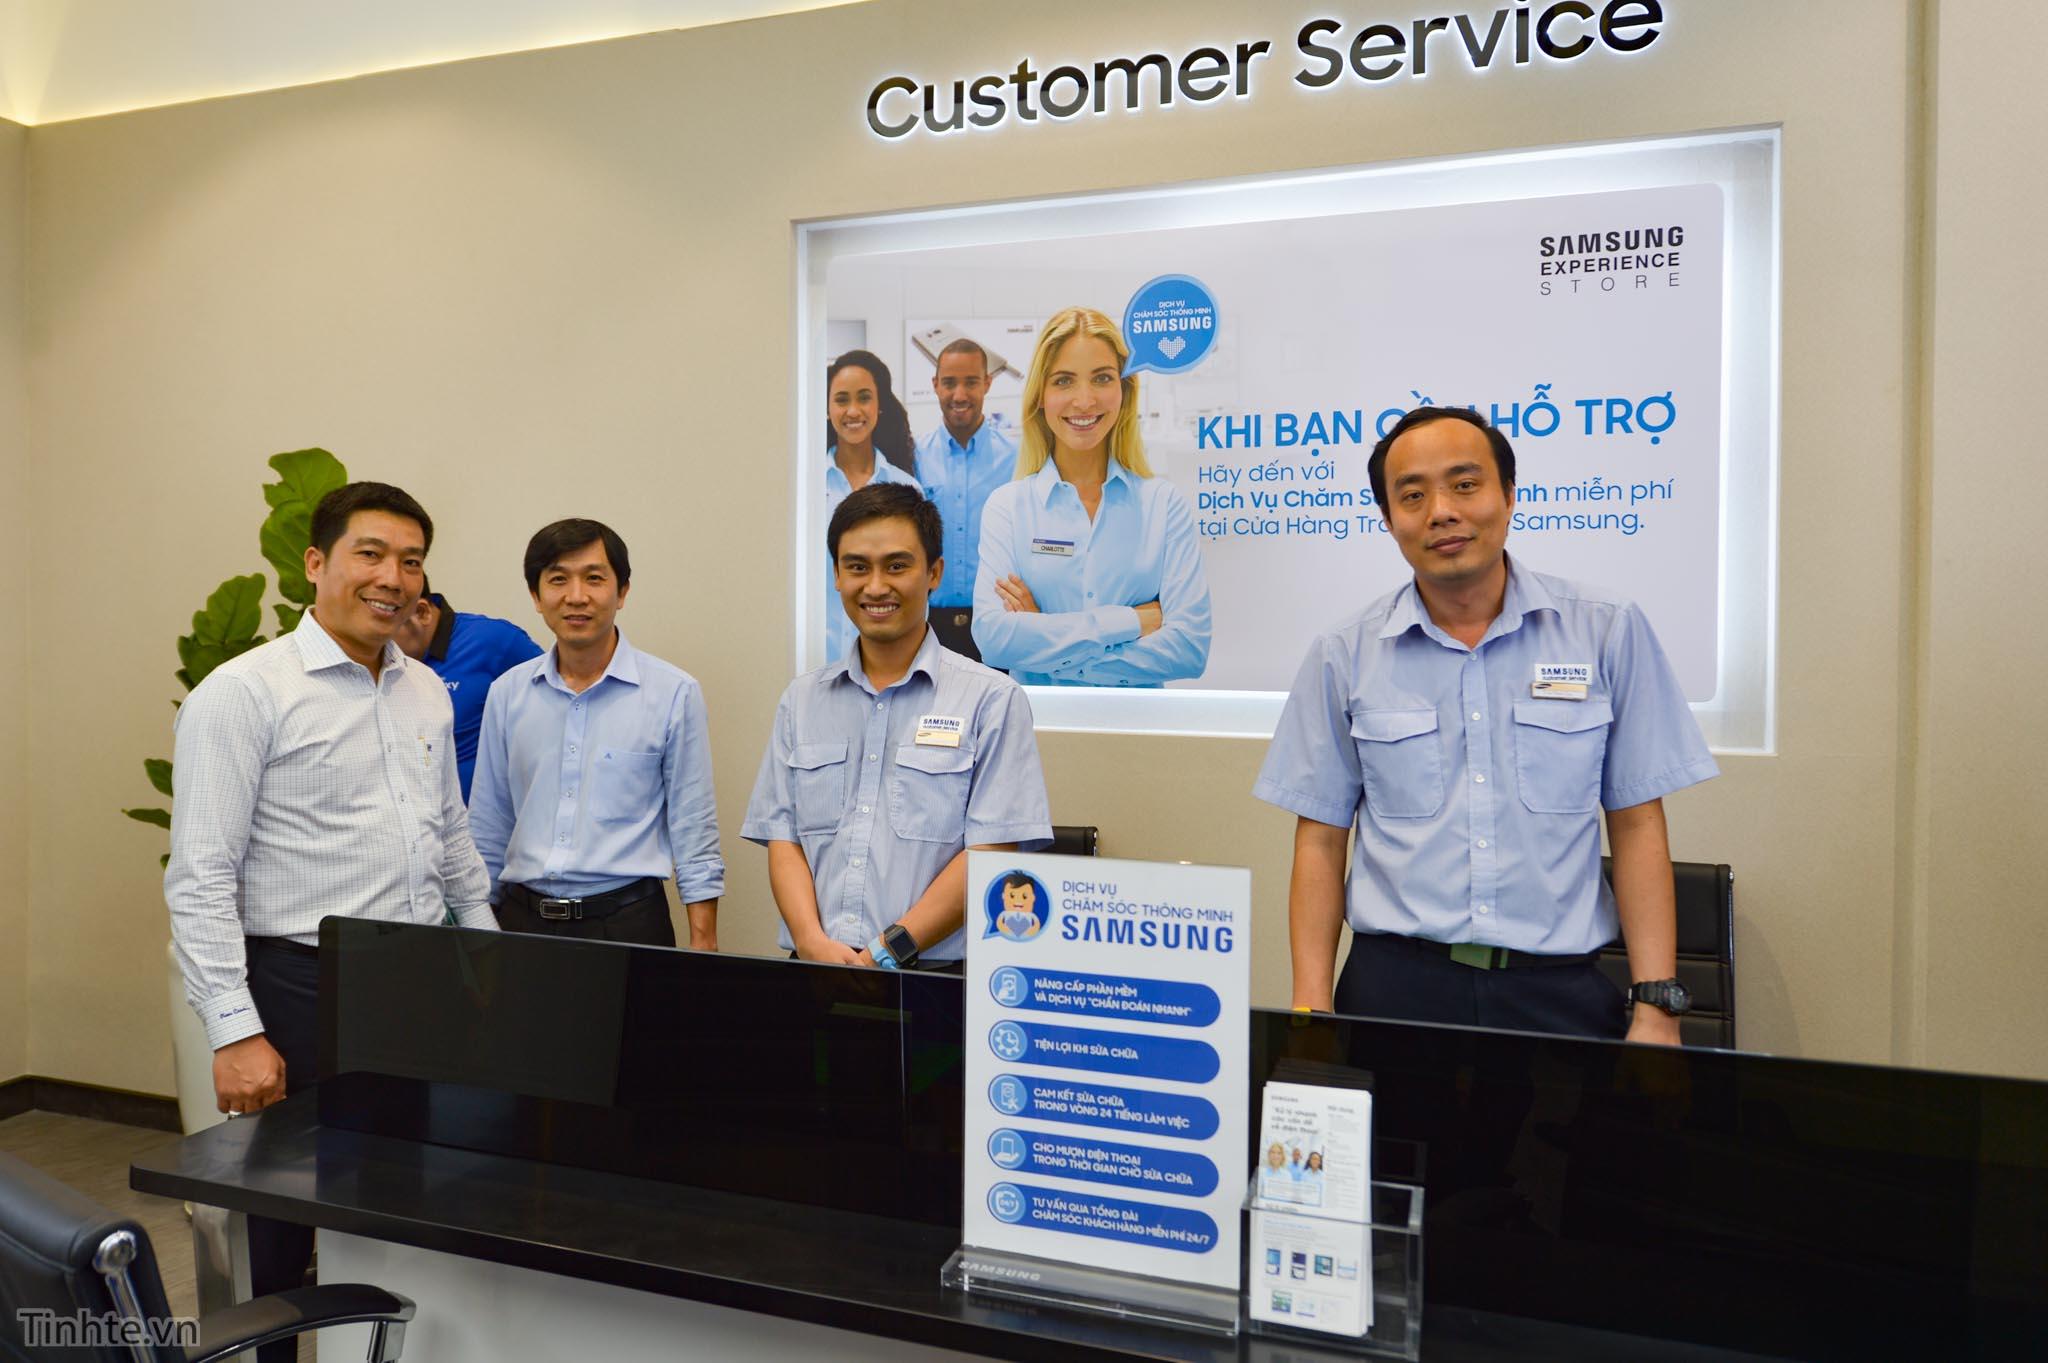 Samsung_Experience_Store_Mai_Nguyen_7.jpg